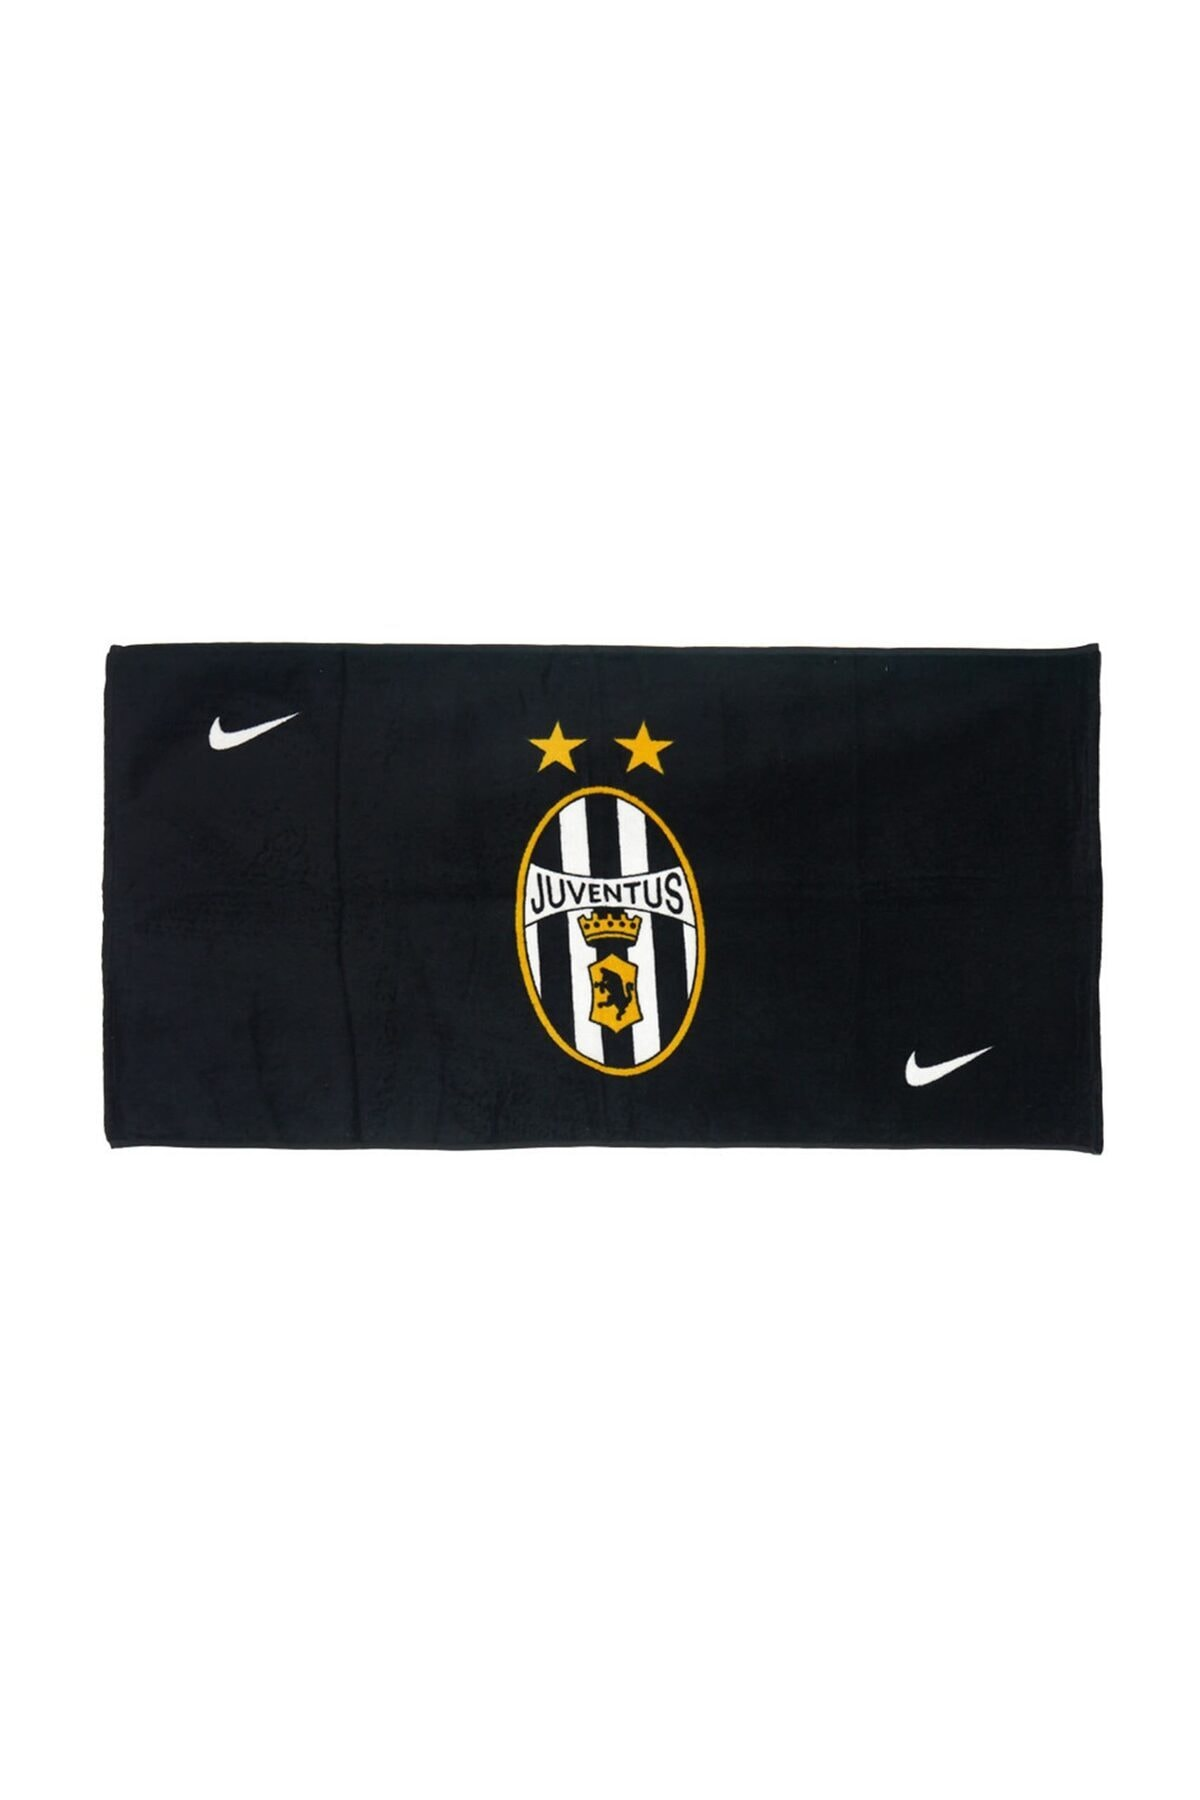 Havlu Juve Sport Towel 591902-010 Siyah